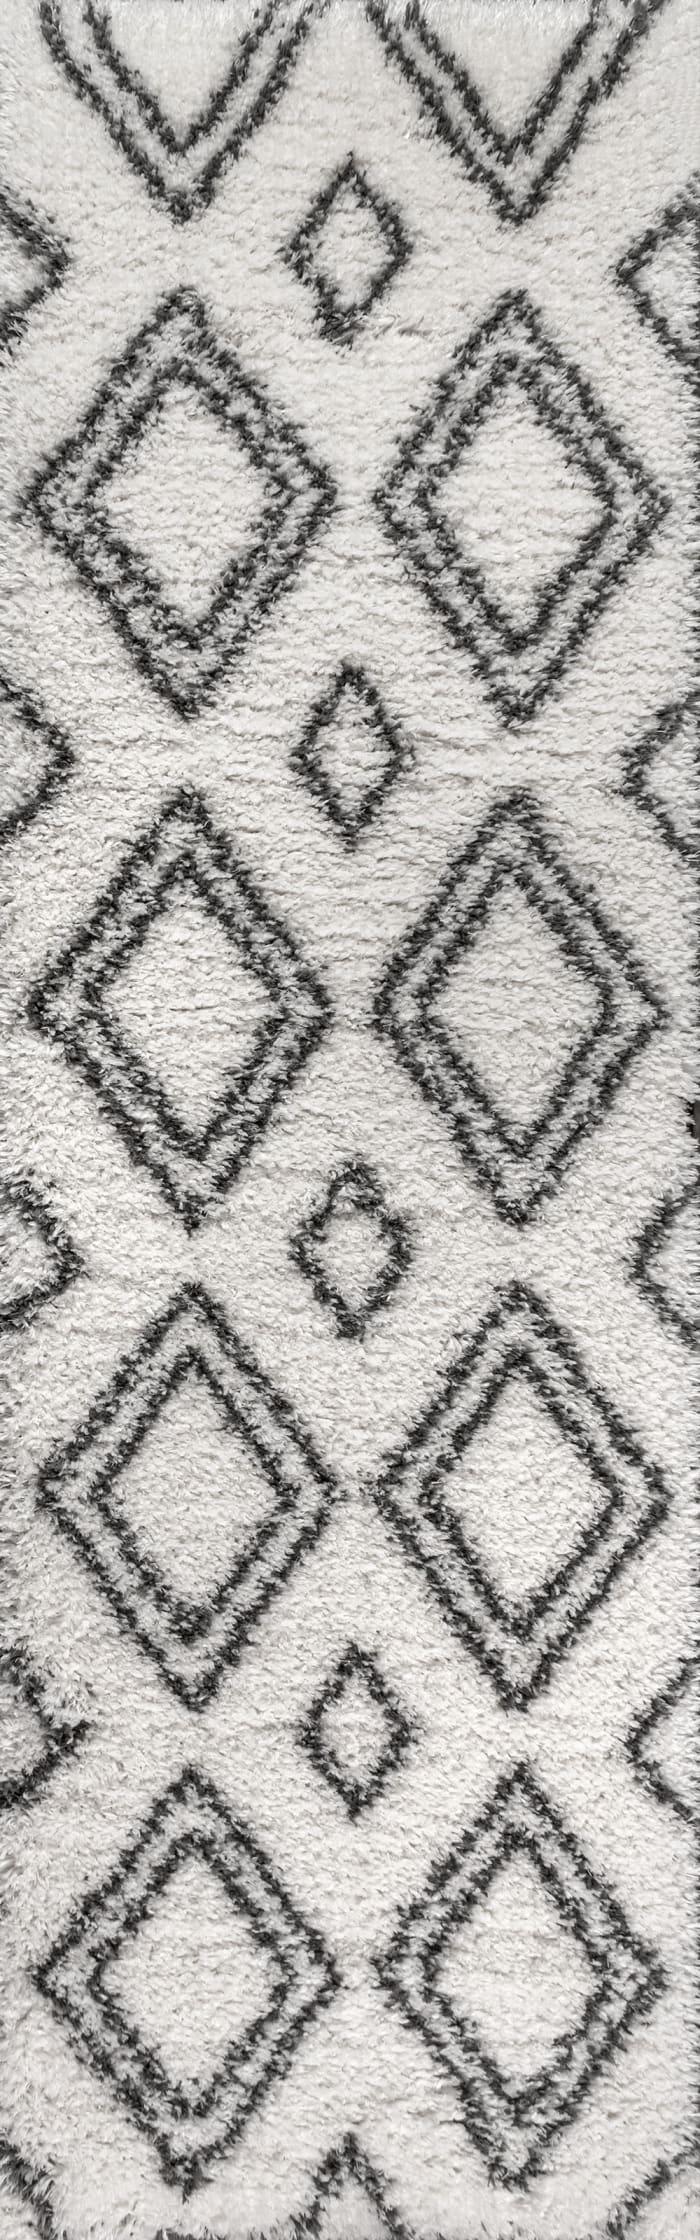 Moroccan Style Diamond Shag Ivory/Dark Gray 2.25' x 8' Runner Rug